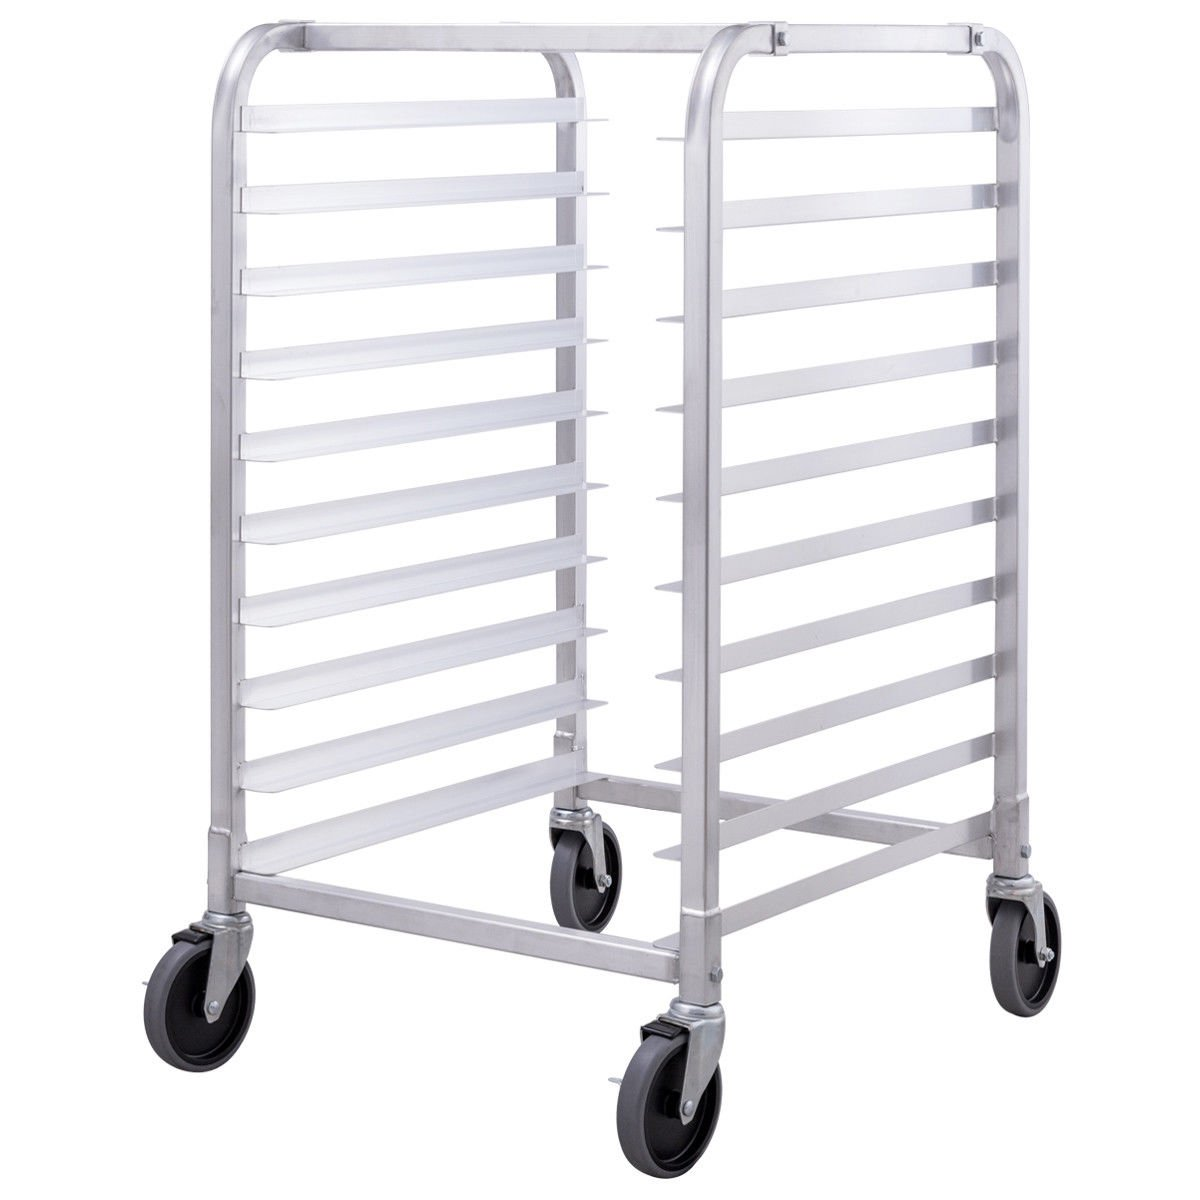 CHEFJOY 10 Sheet Aluminum Kitchen Bun Pan Sheet Rack w/Wheels 2 Lockable Home Commercial Use Bakery Cooling Rack Open Shelf